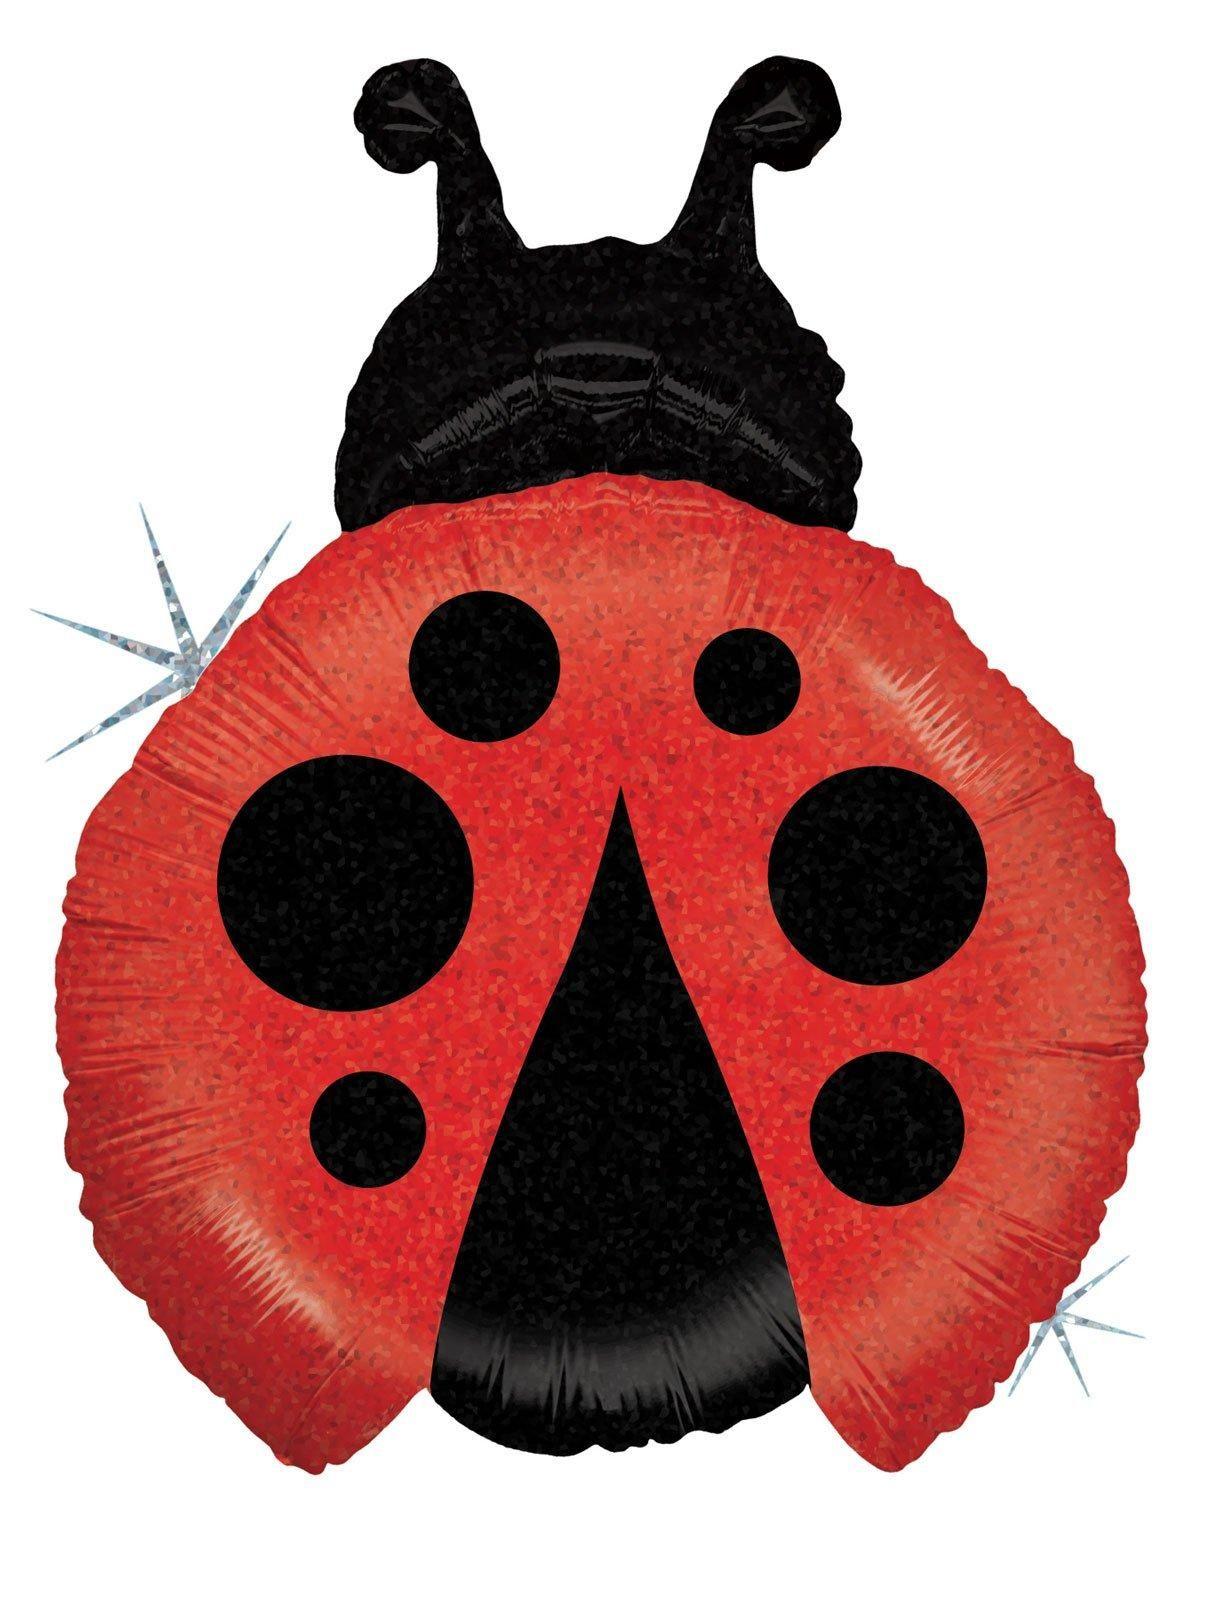 Ladybug Shaped Jumbo Foil Balloon from